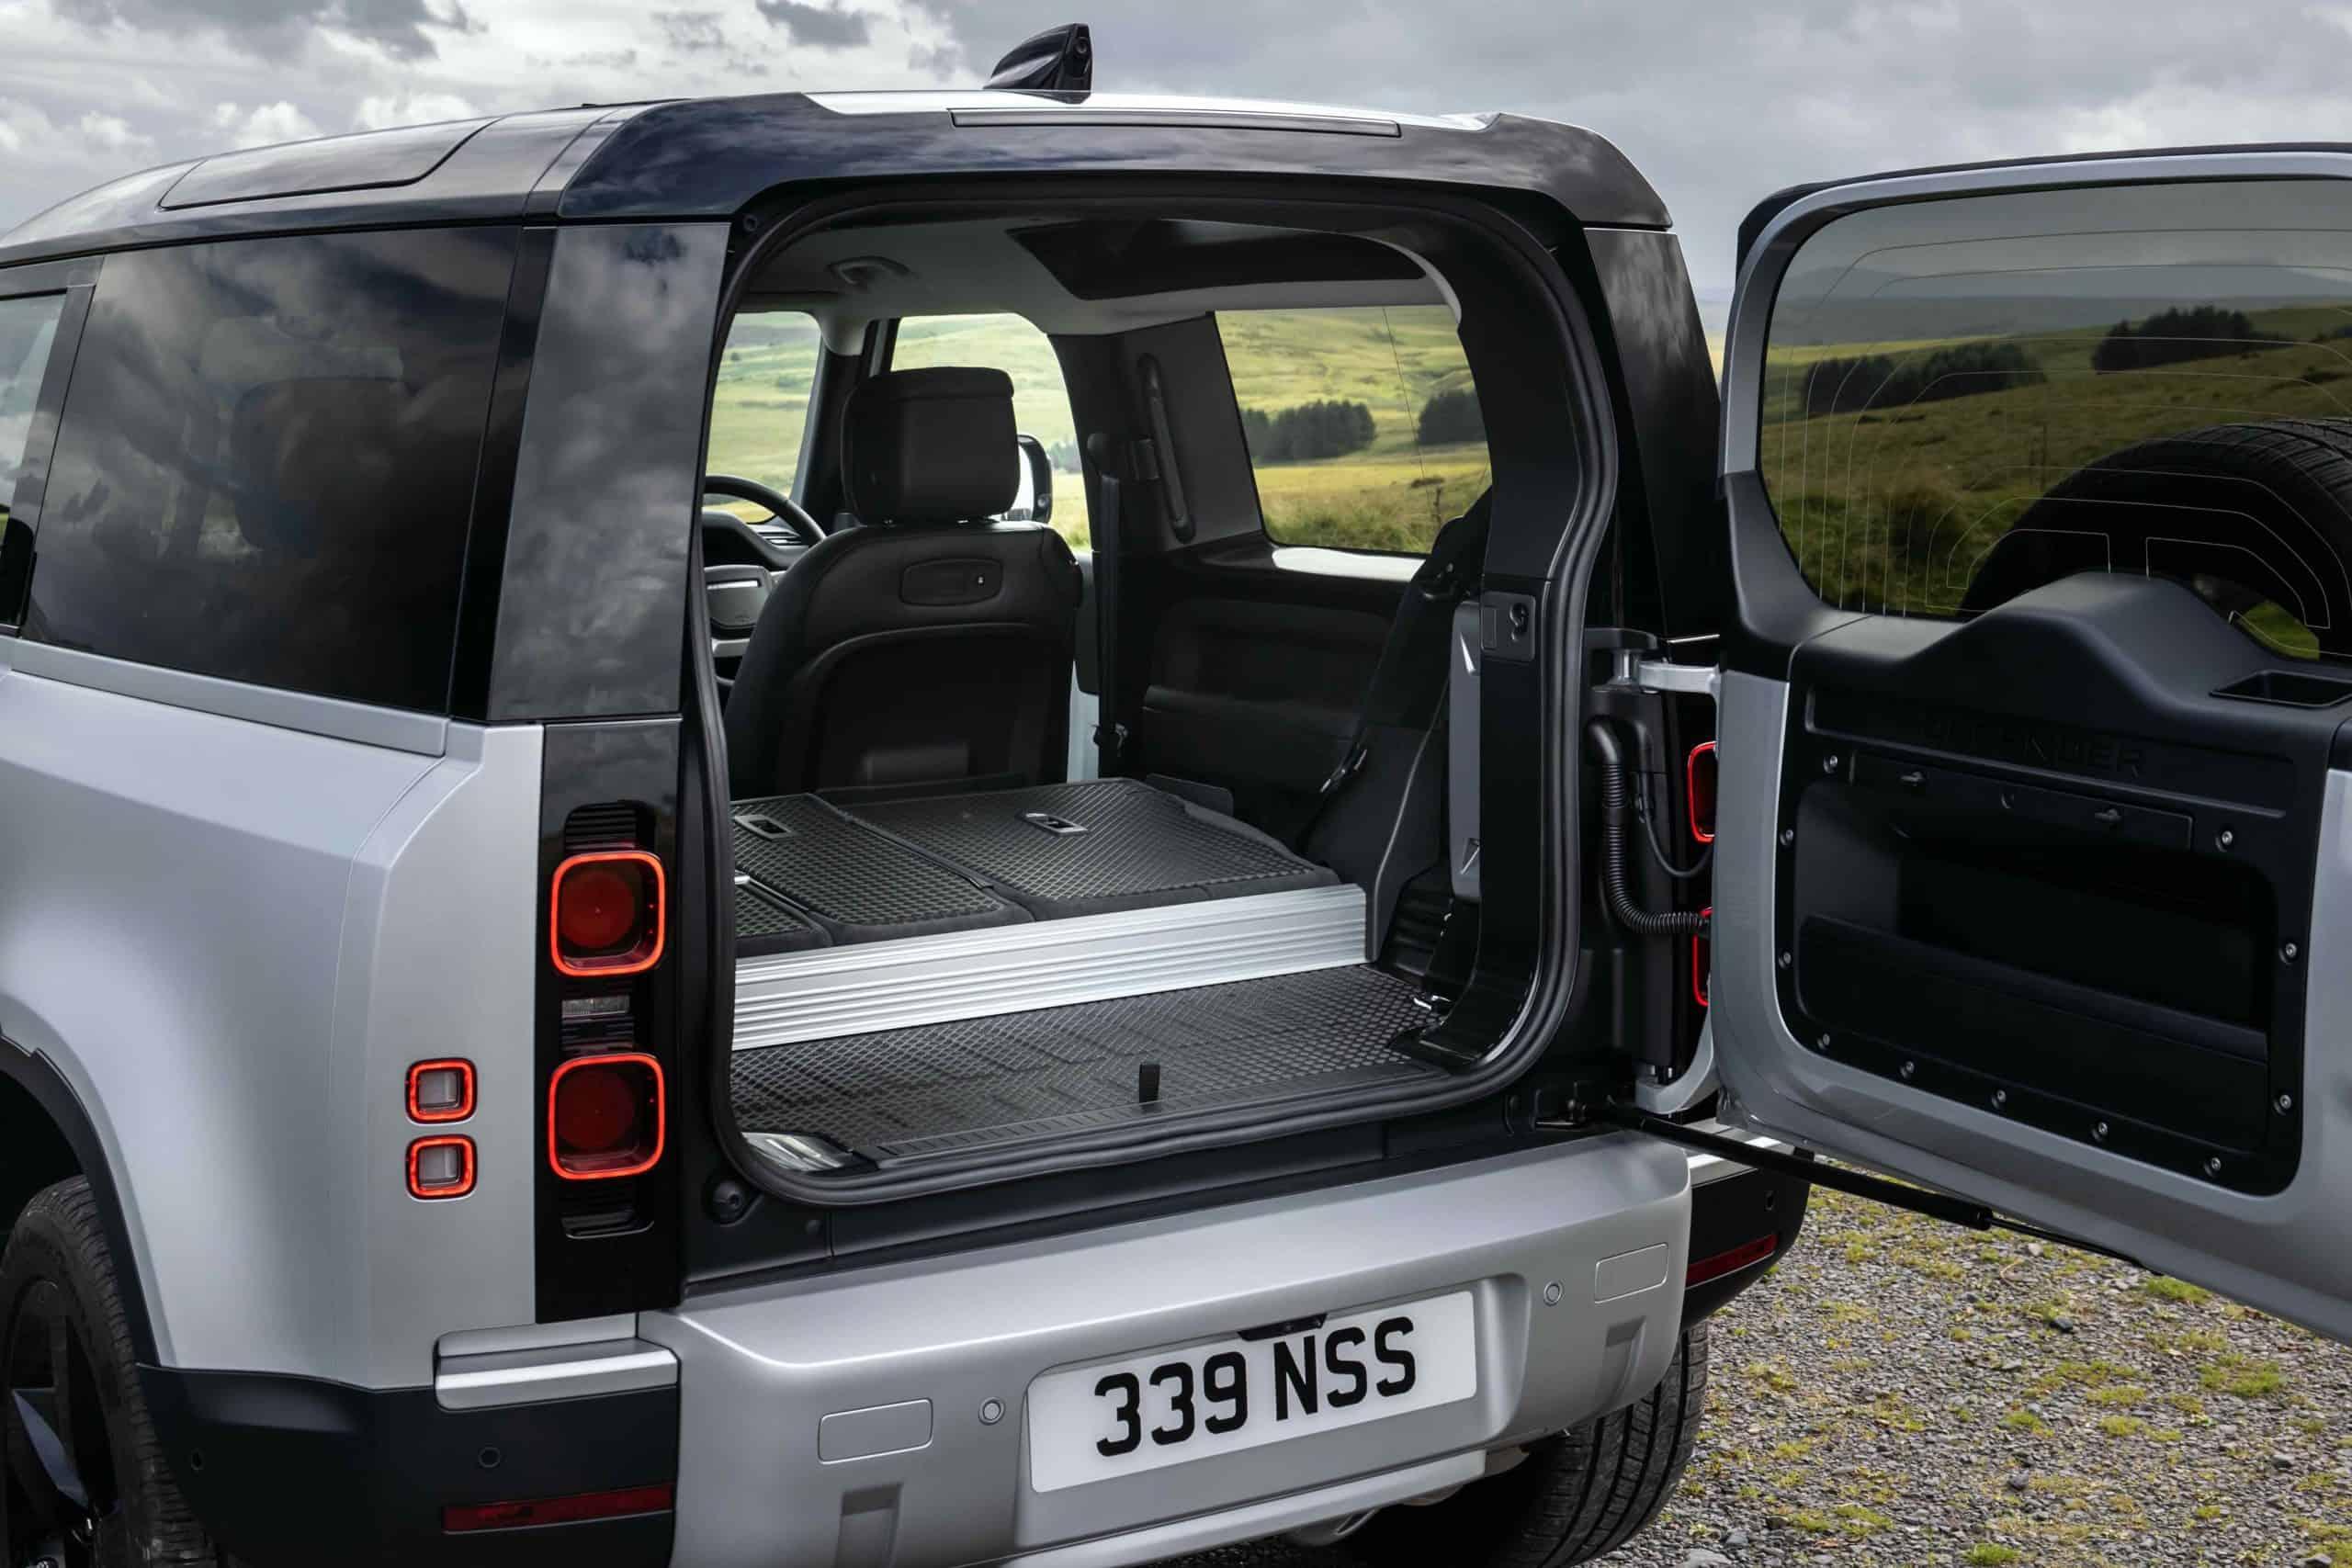 2021 Land Rover Defender 90 cargo room